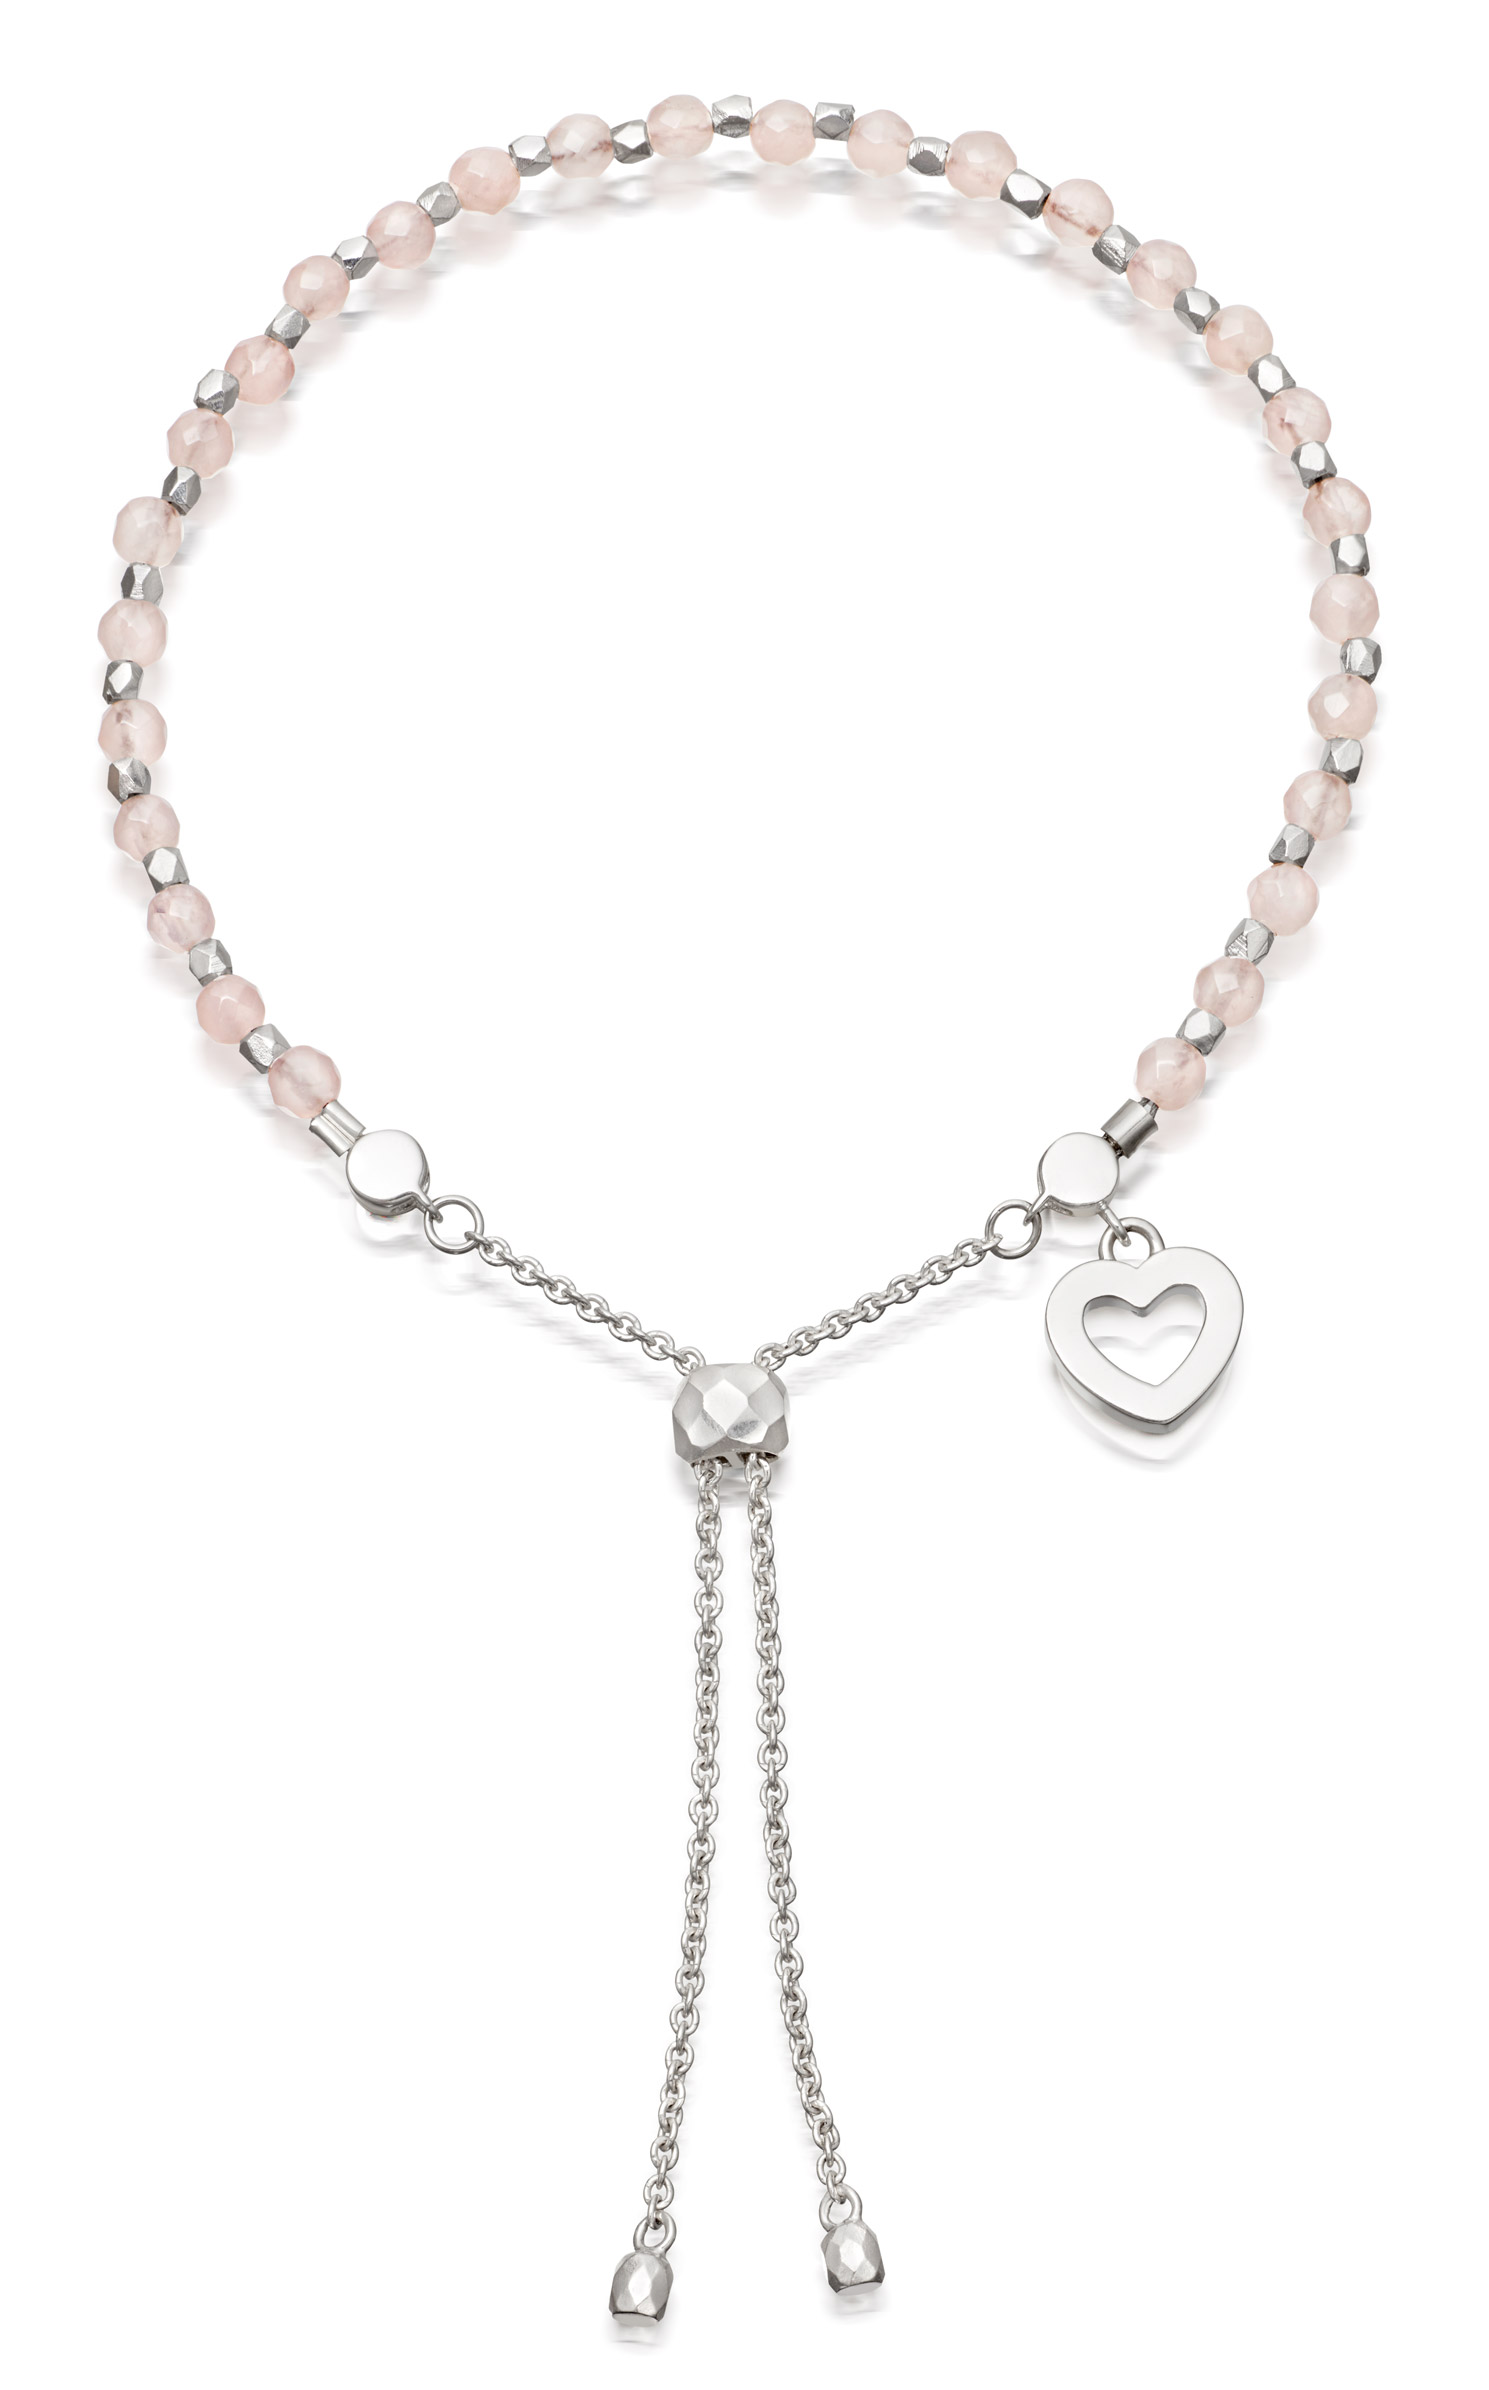 Astley-Clarke-Rose-Quartz-Friendship-Bracelet £70